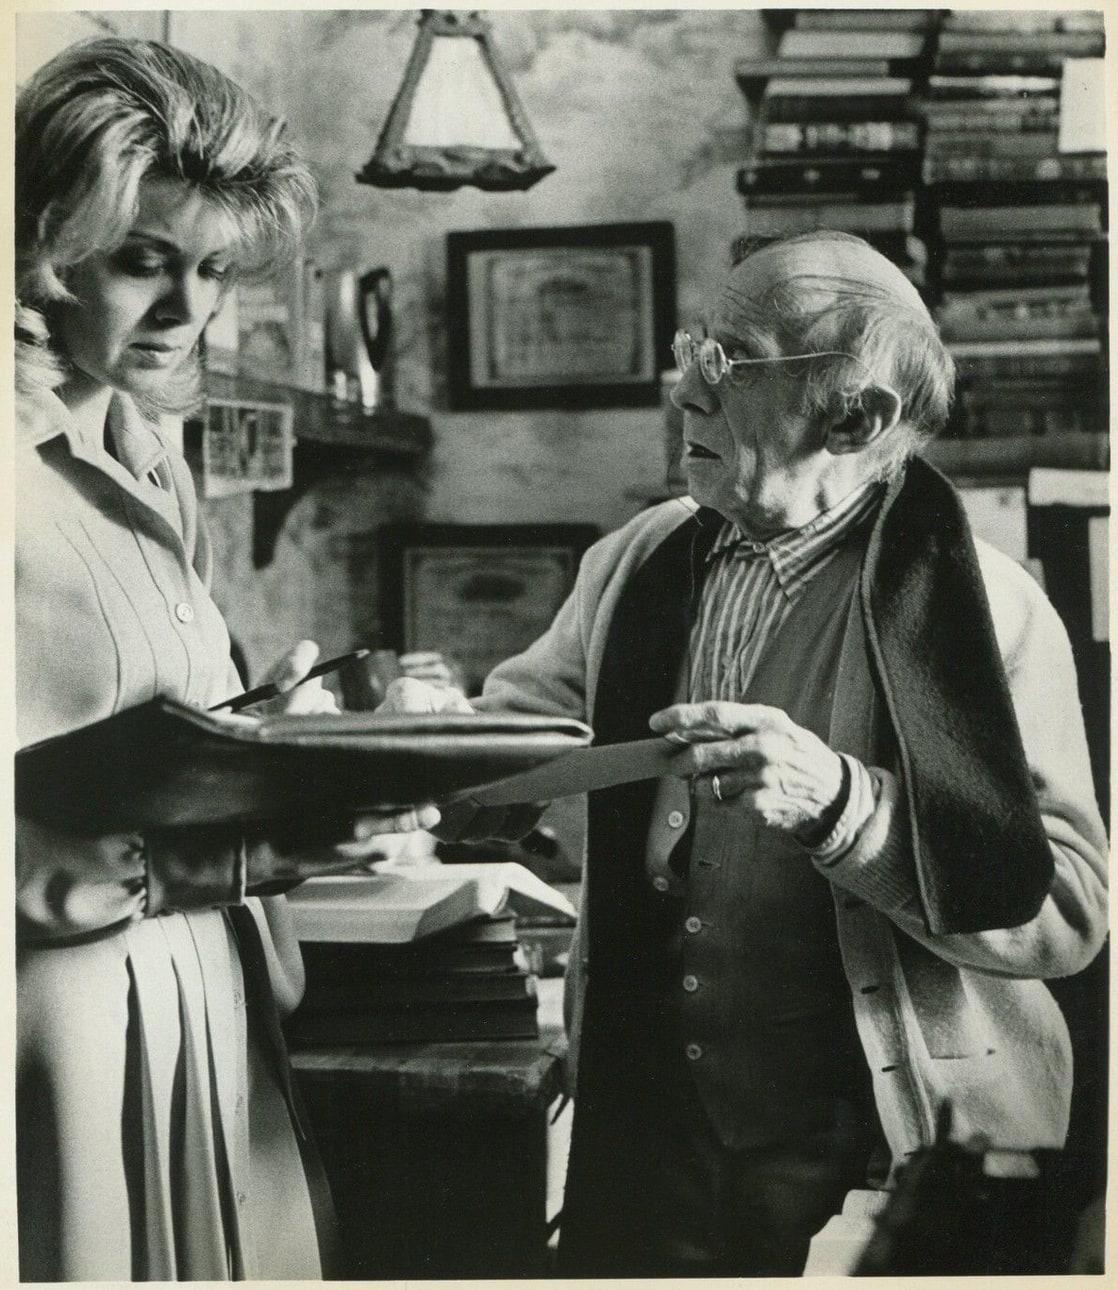 Angel Tompkins,David Prowse (born 1935) Adult fotos Natalie Morales (actress),Octavia Spencer